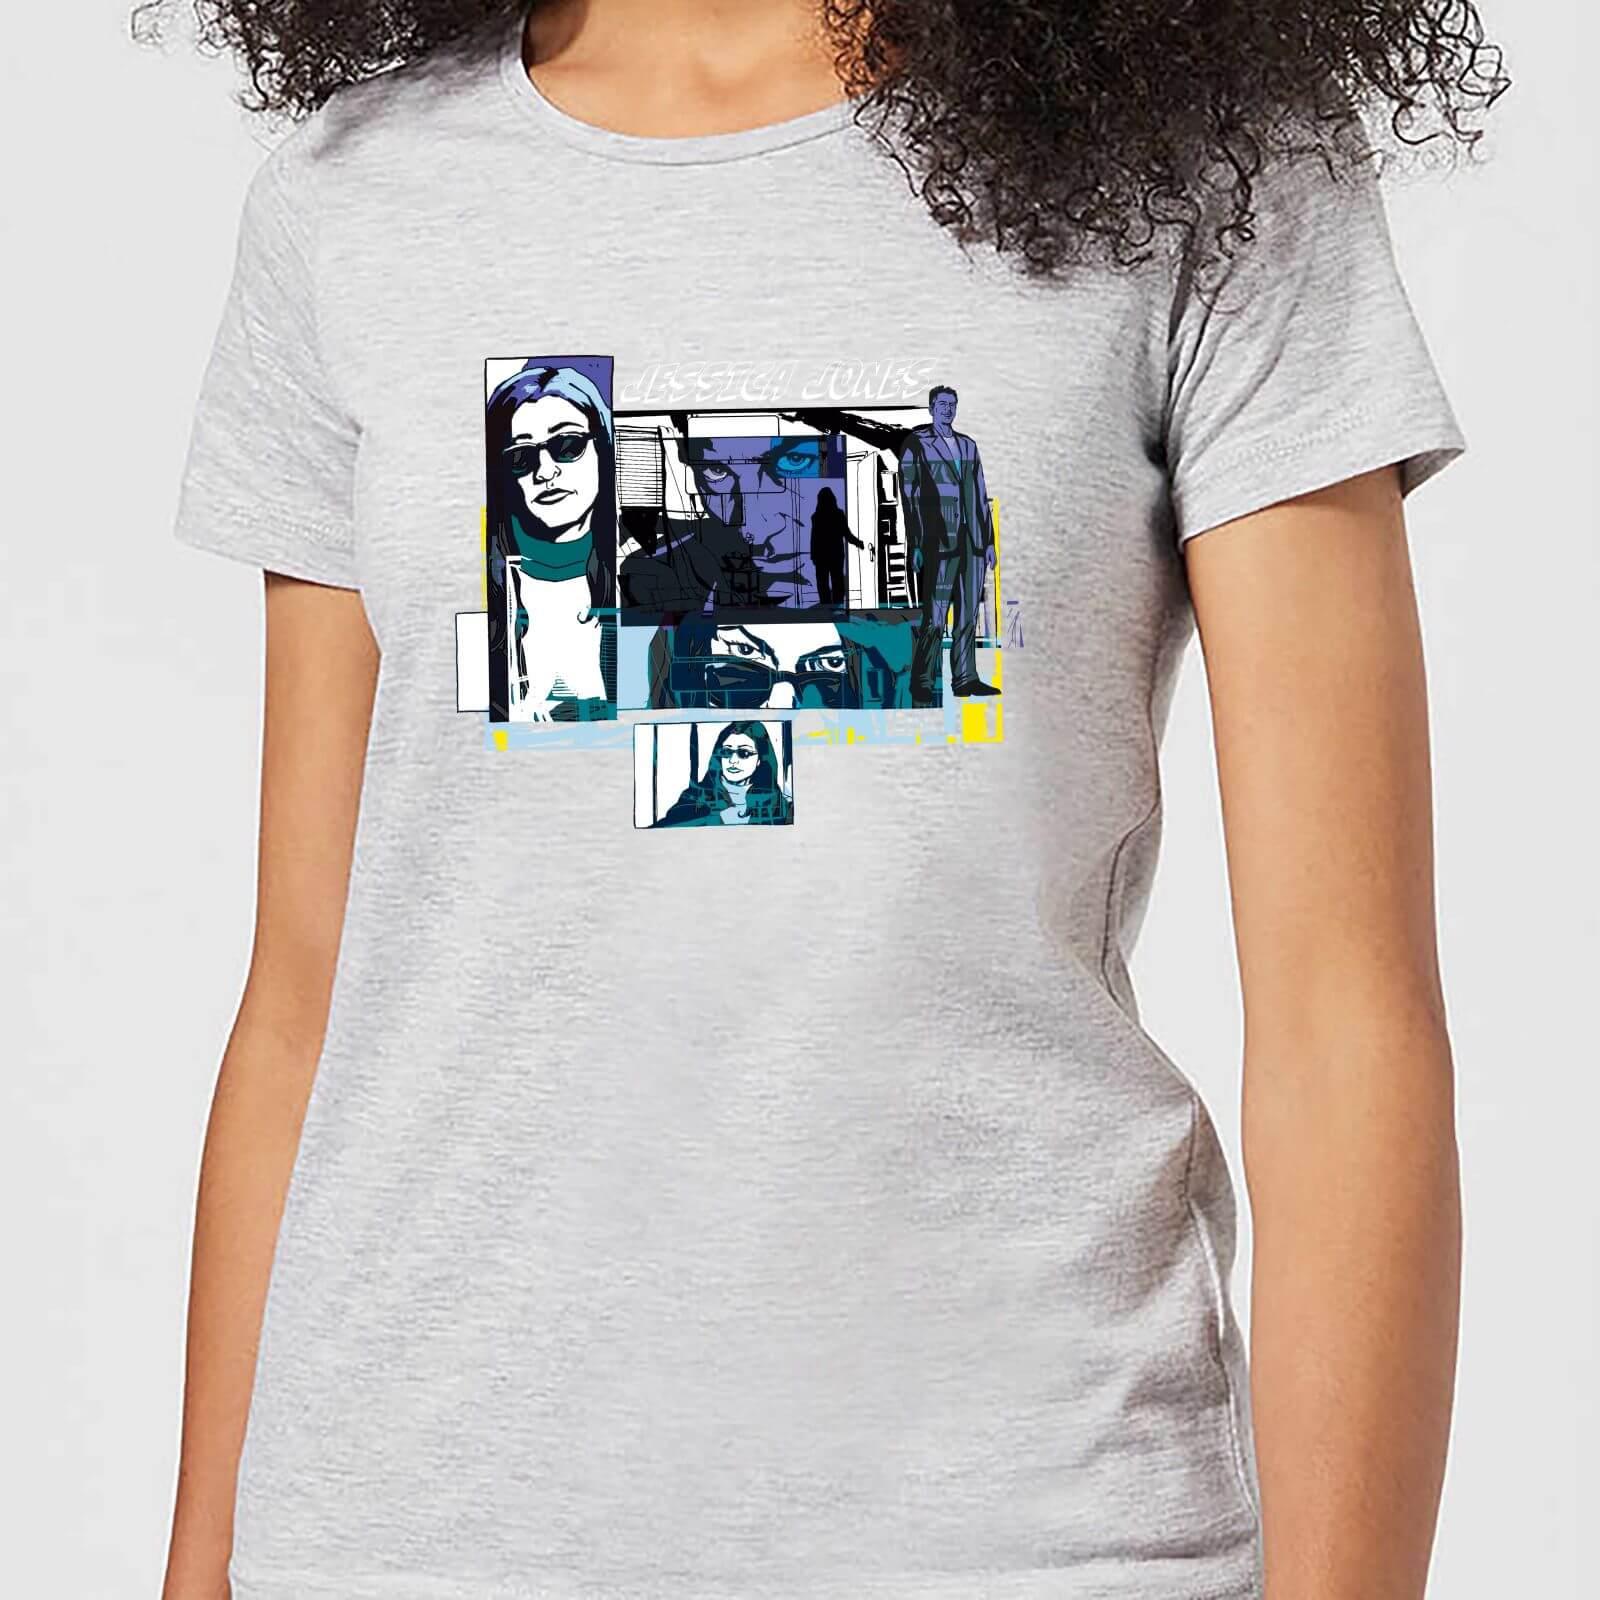 OfferteWeb.click 72-t-shirt-marvel-knights-jessica-jones-comic-panels-grigio